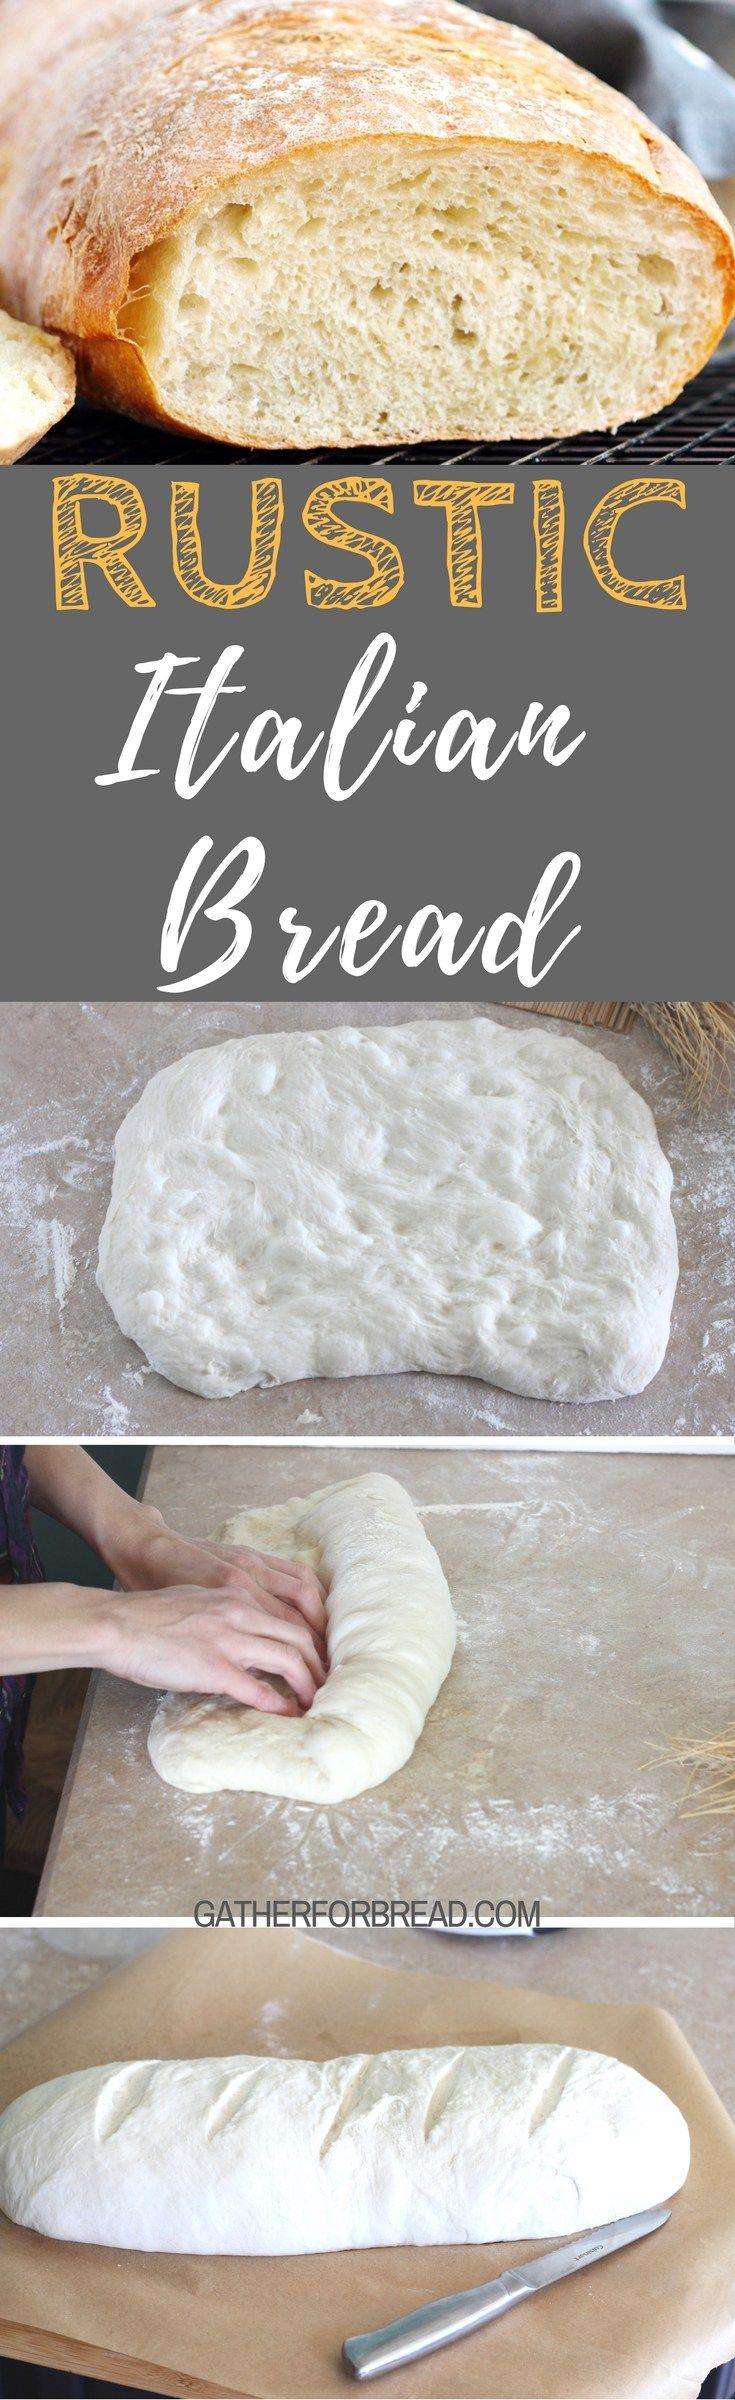 Rustic Italian Bread - How to make crusty homemade Italian bread ...